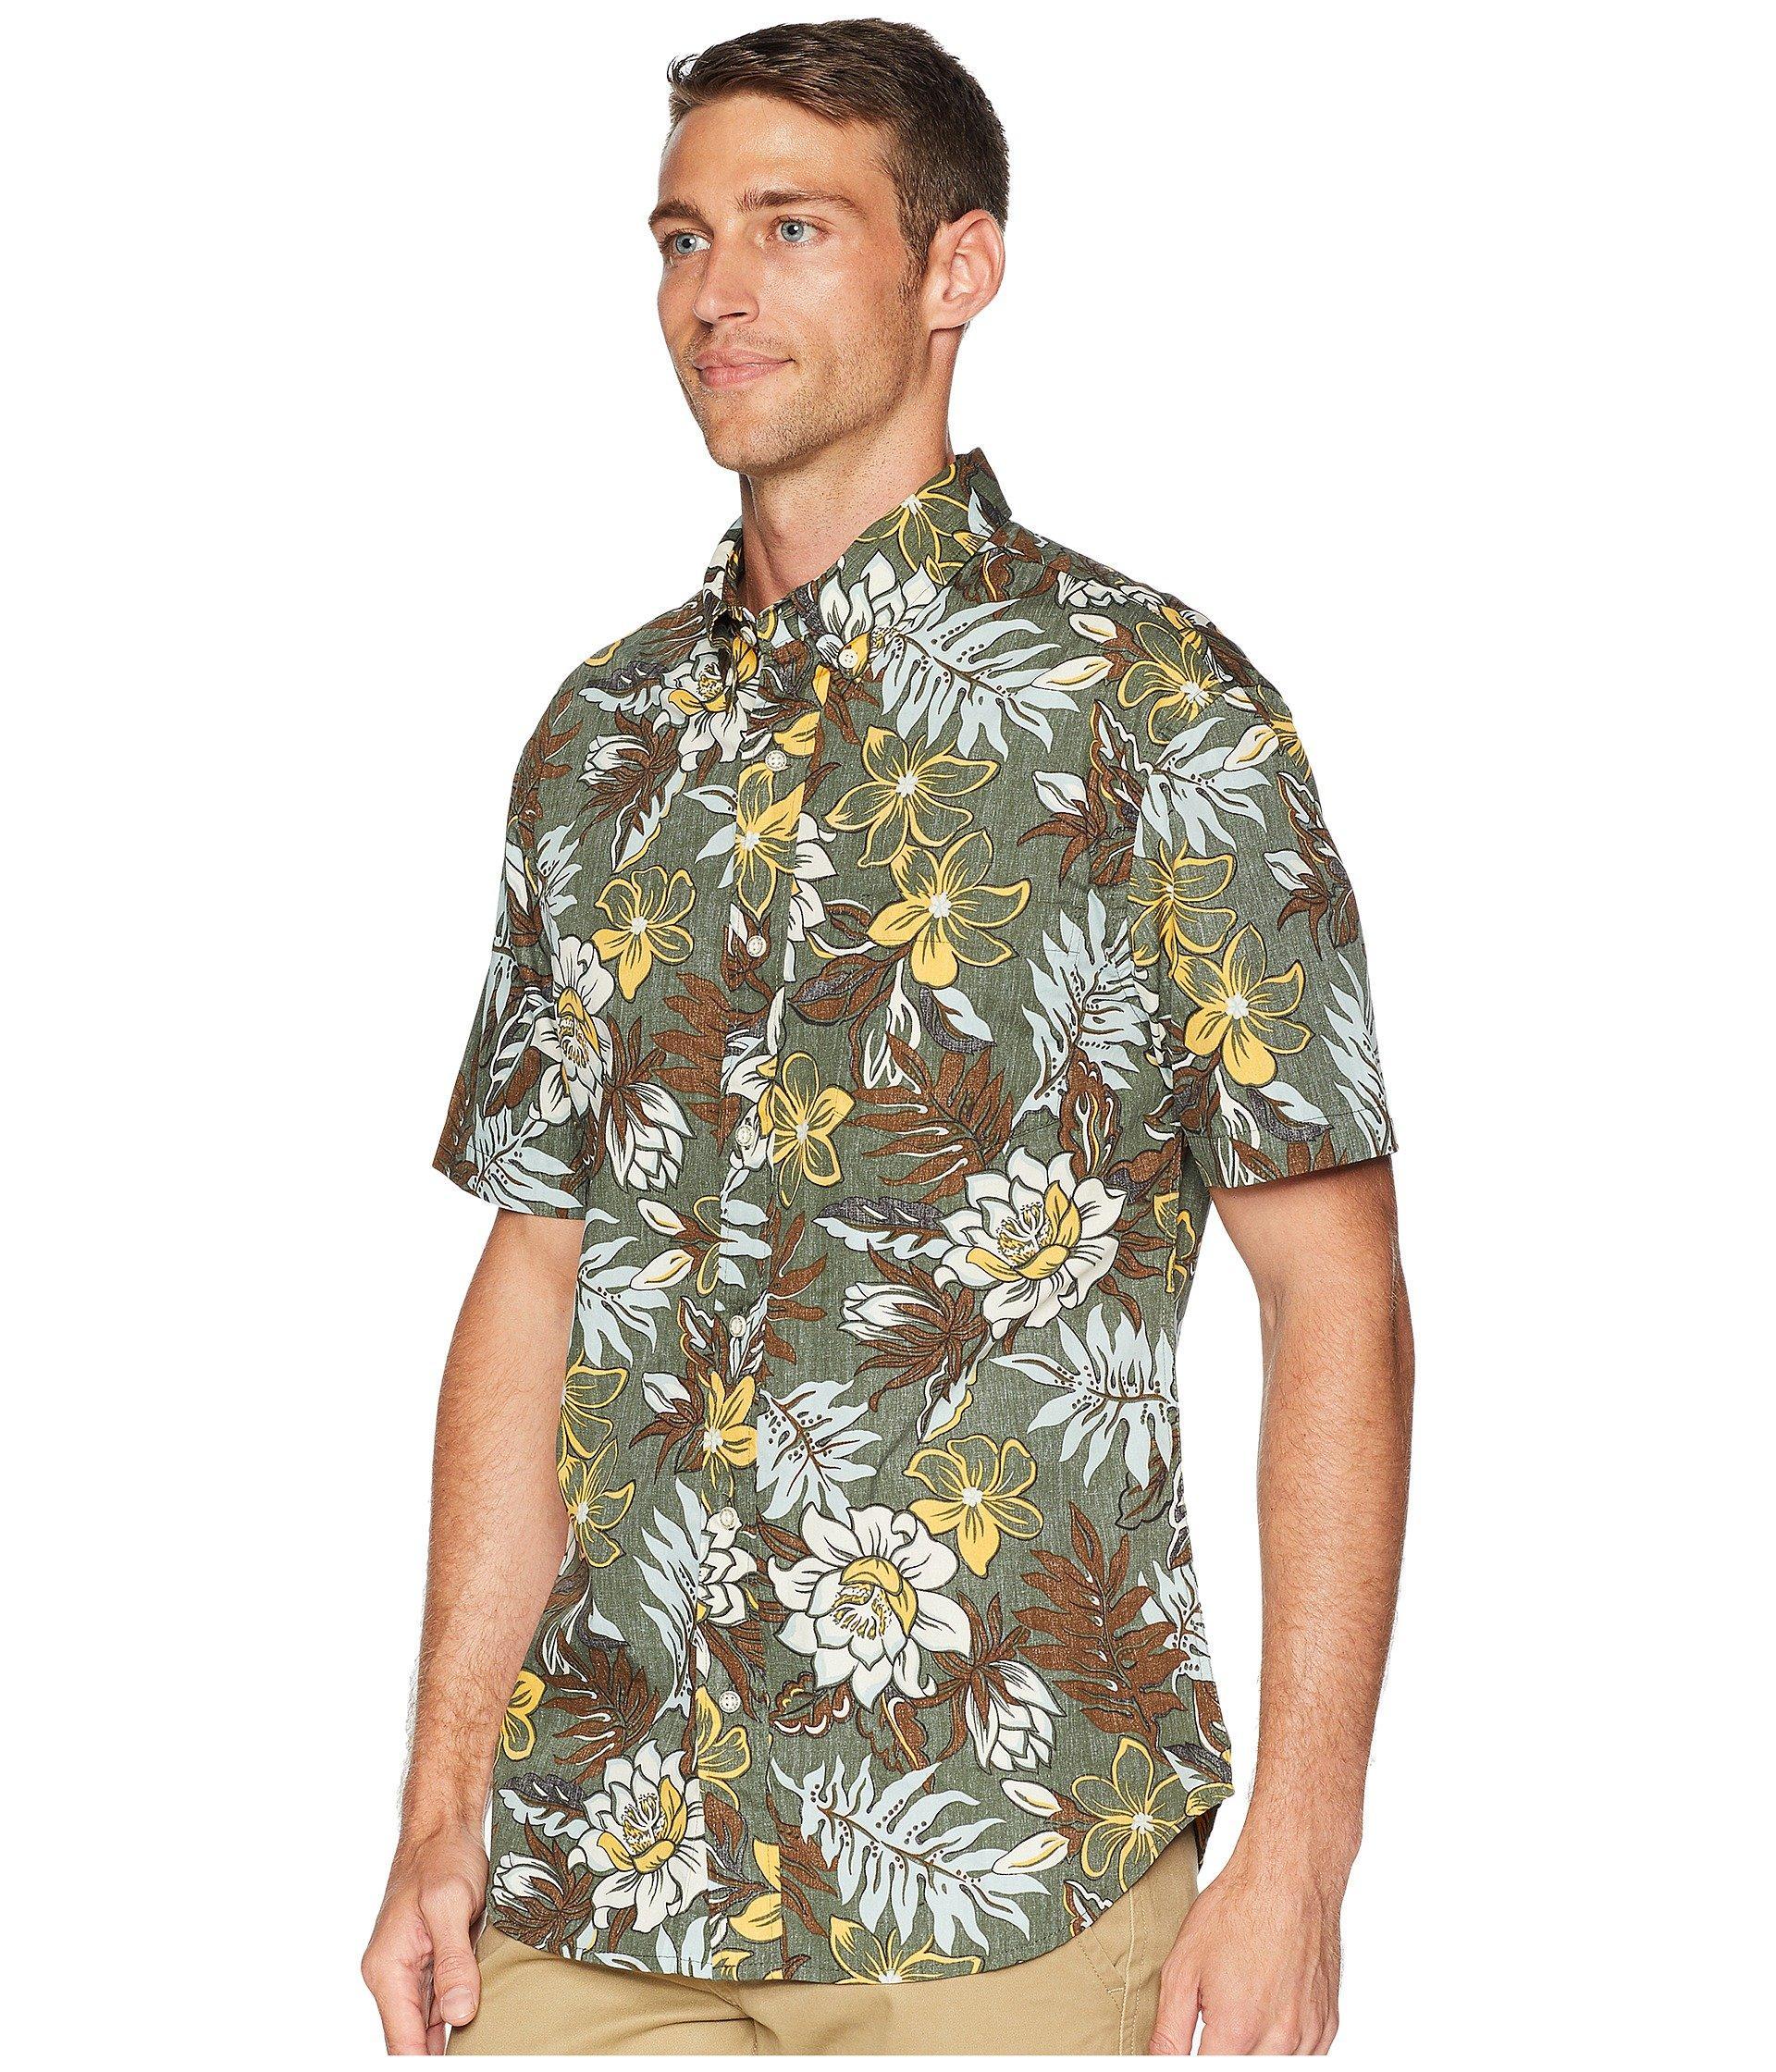 94716fa5162 Lyst - Reyn Spooner Vintage Hawaiian Floral Tailored Aloha Shirt in Green  for Men - Save 29%